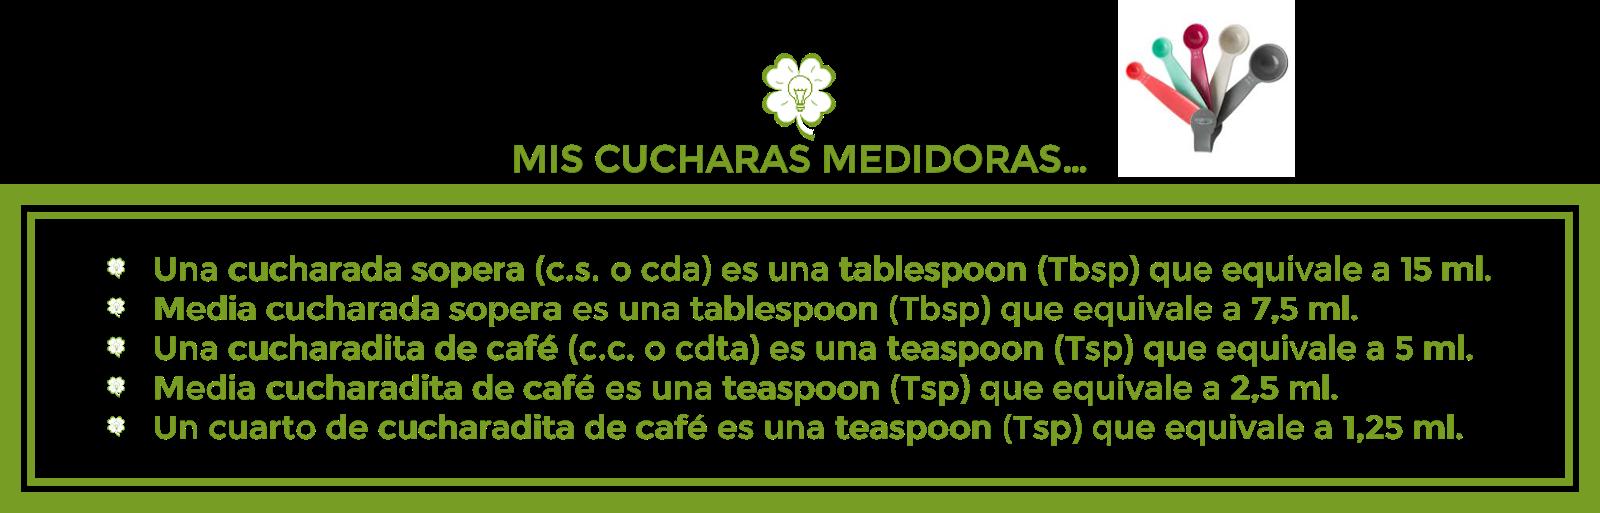 MIS CUCHARAS MEDIDORAS